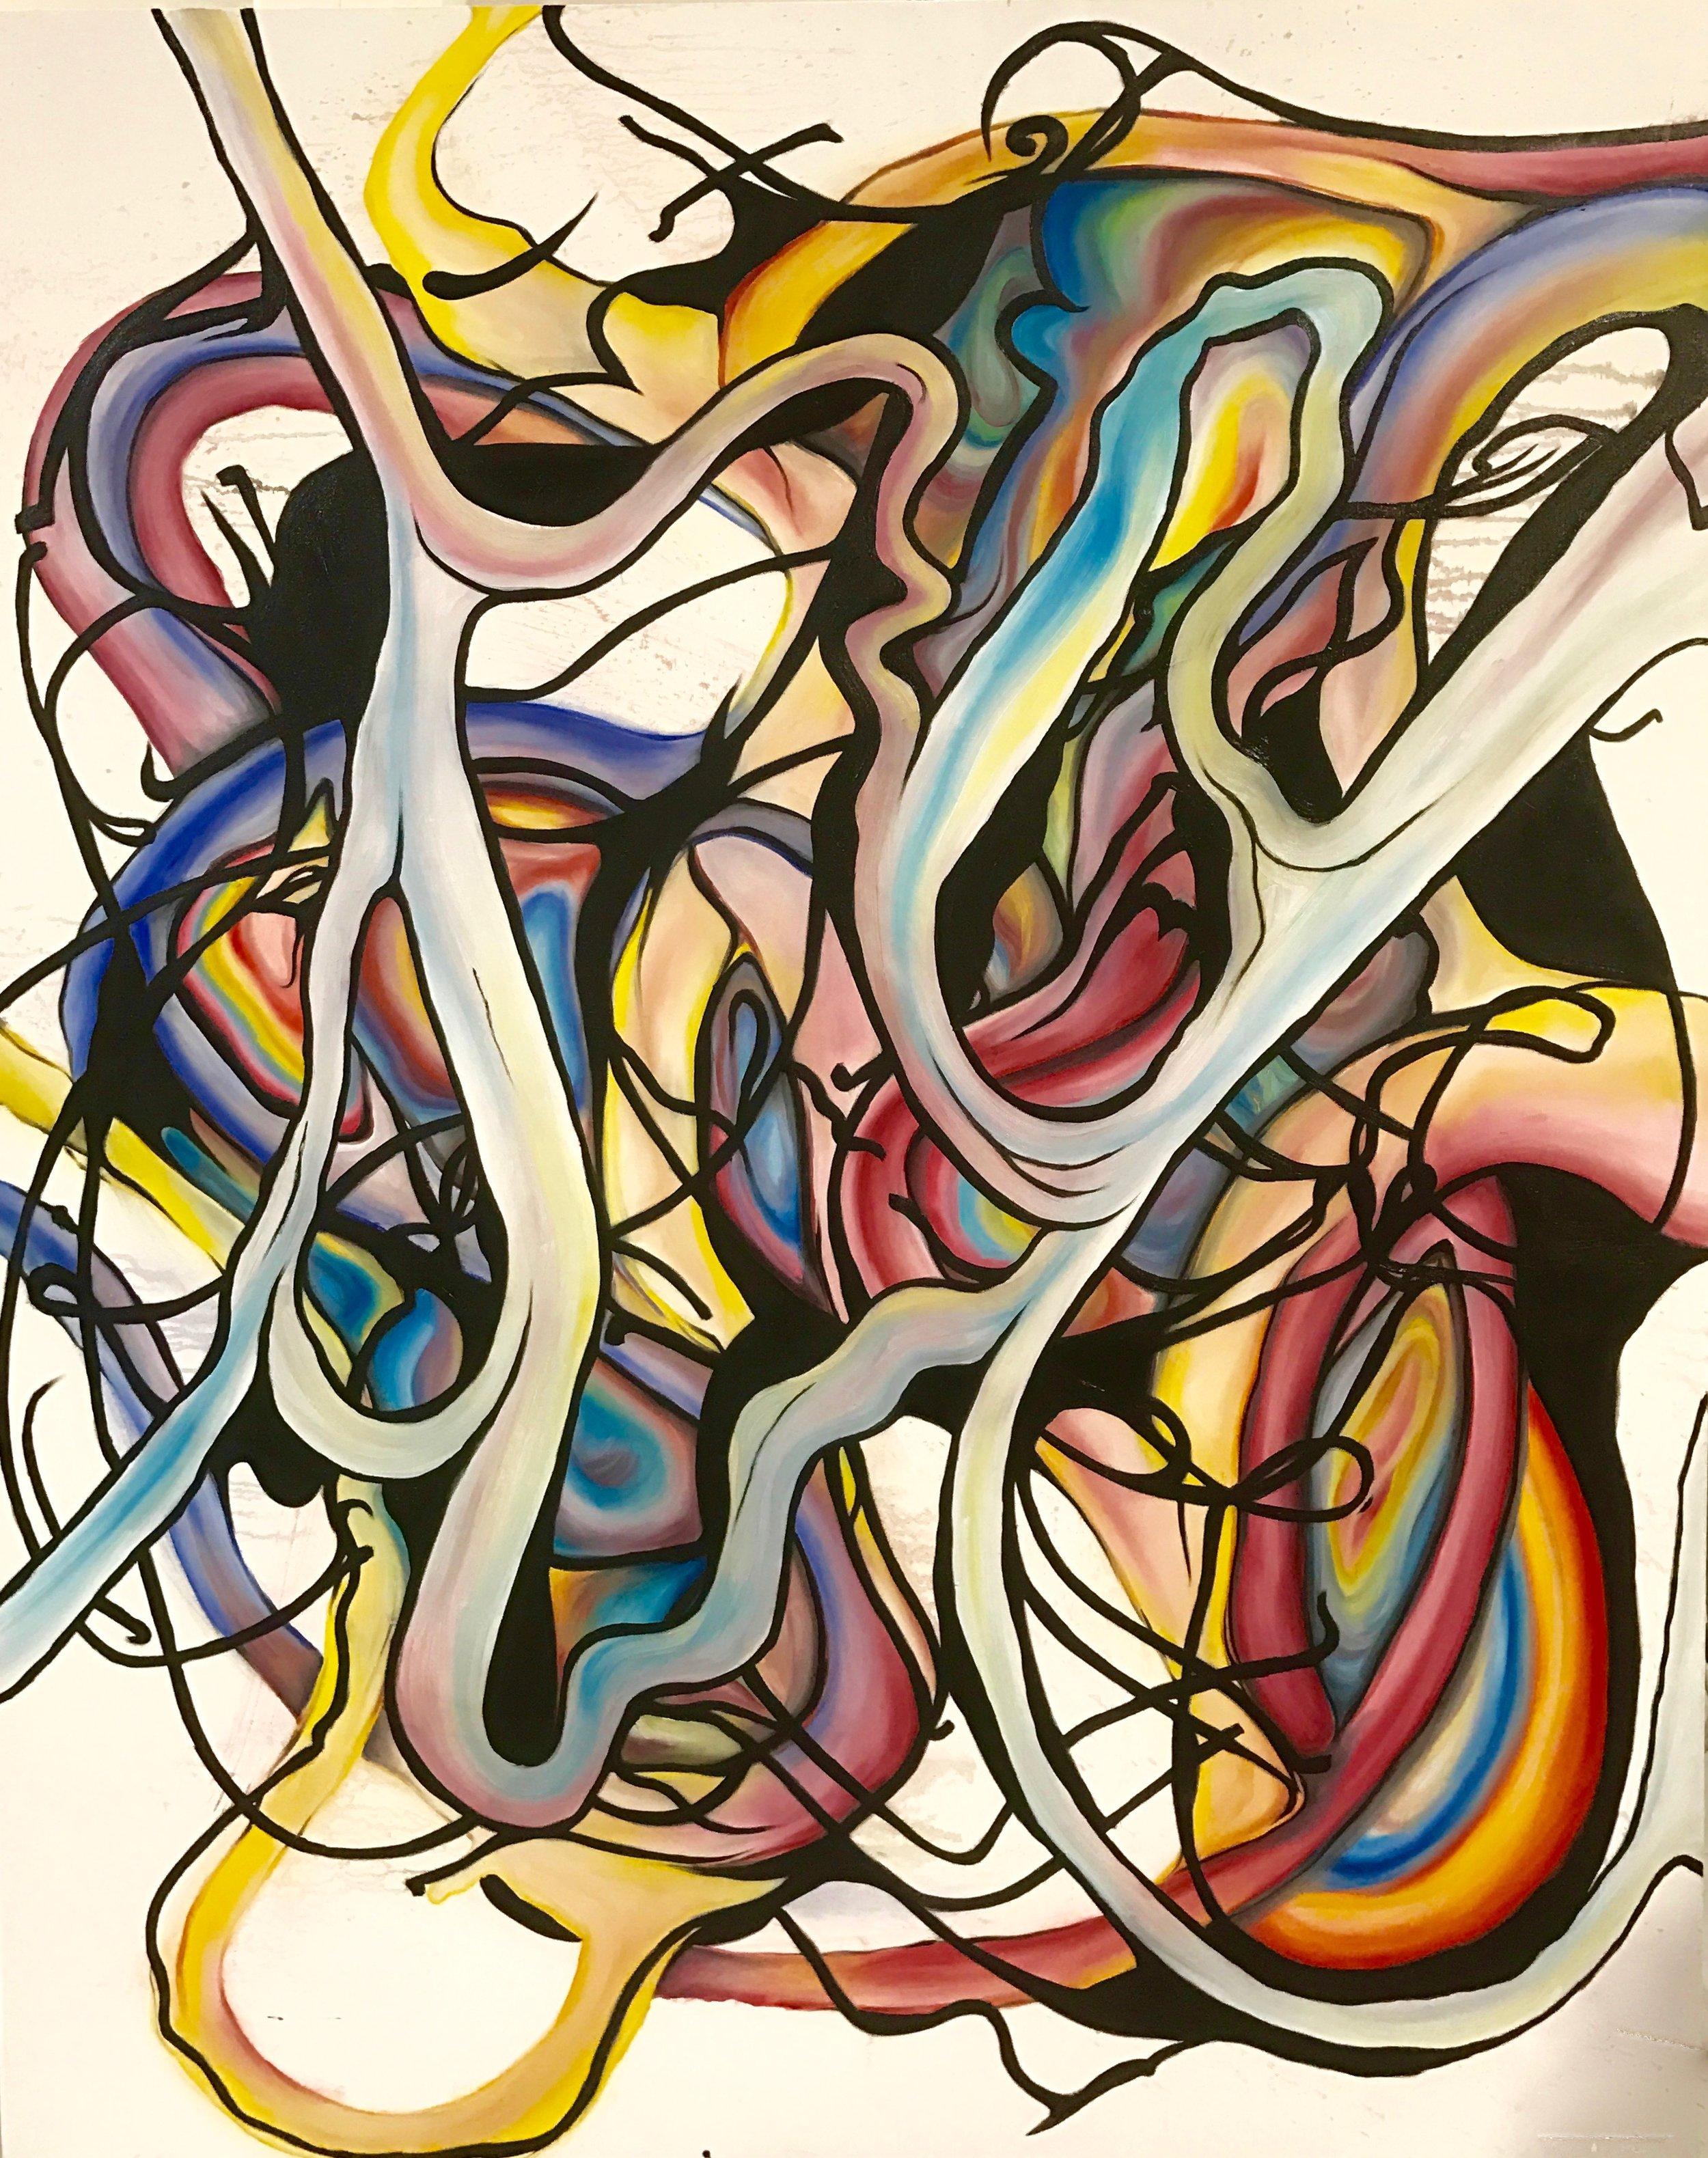 Joropo , 2017  Oil on canvas, 48 x 60 in.